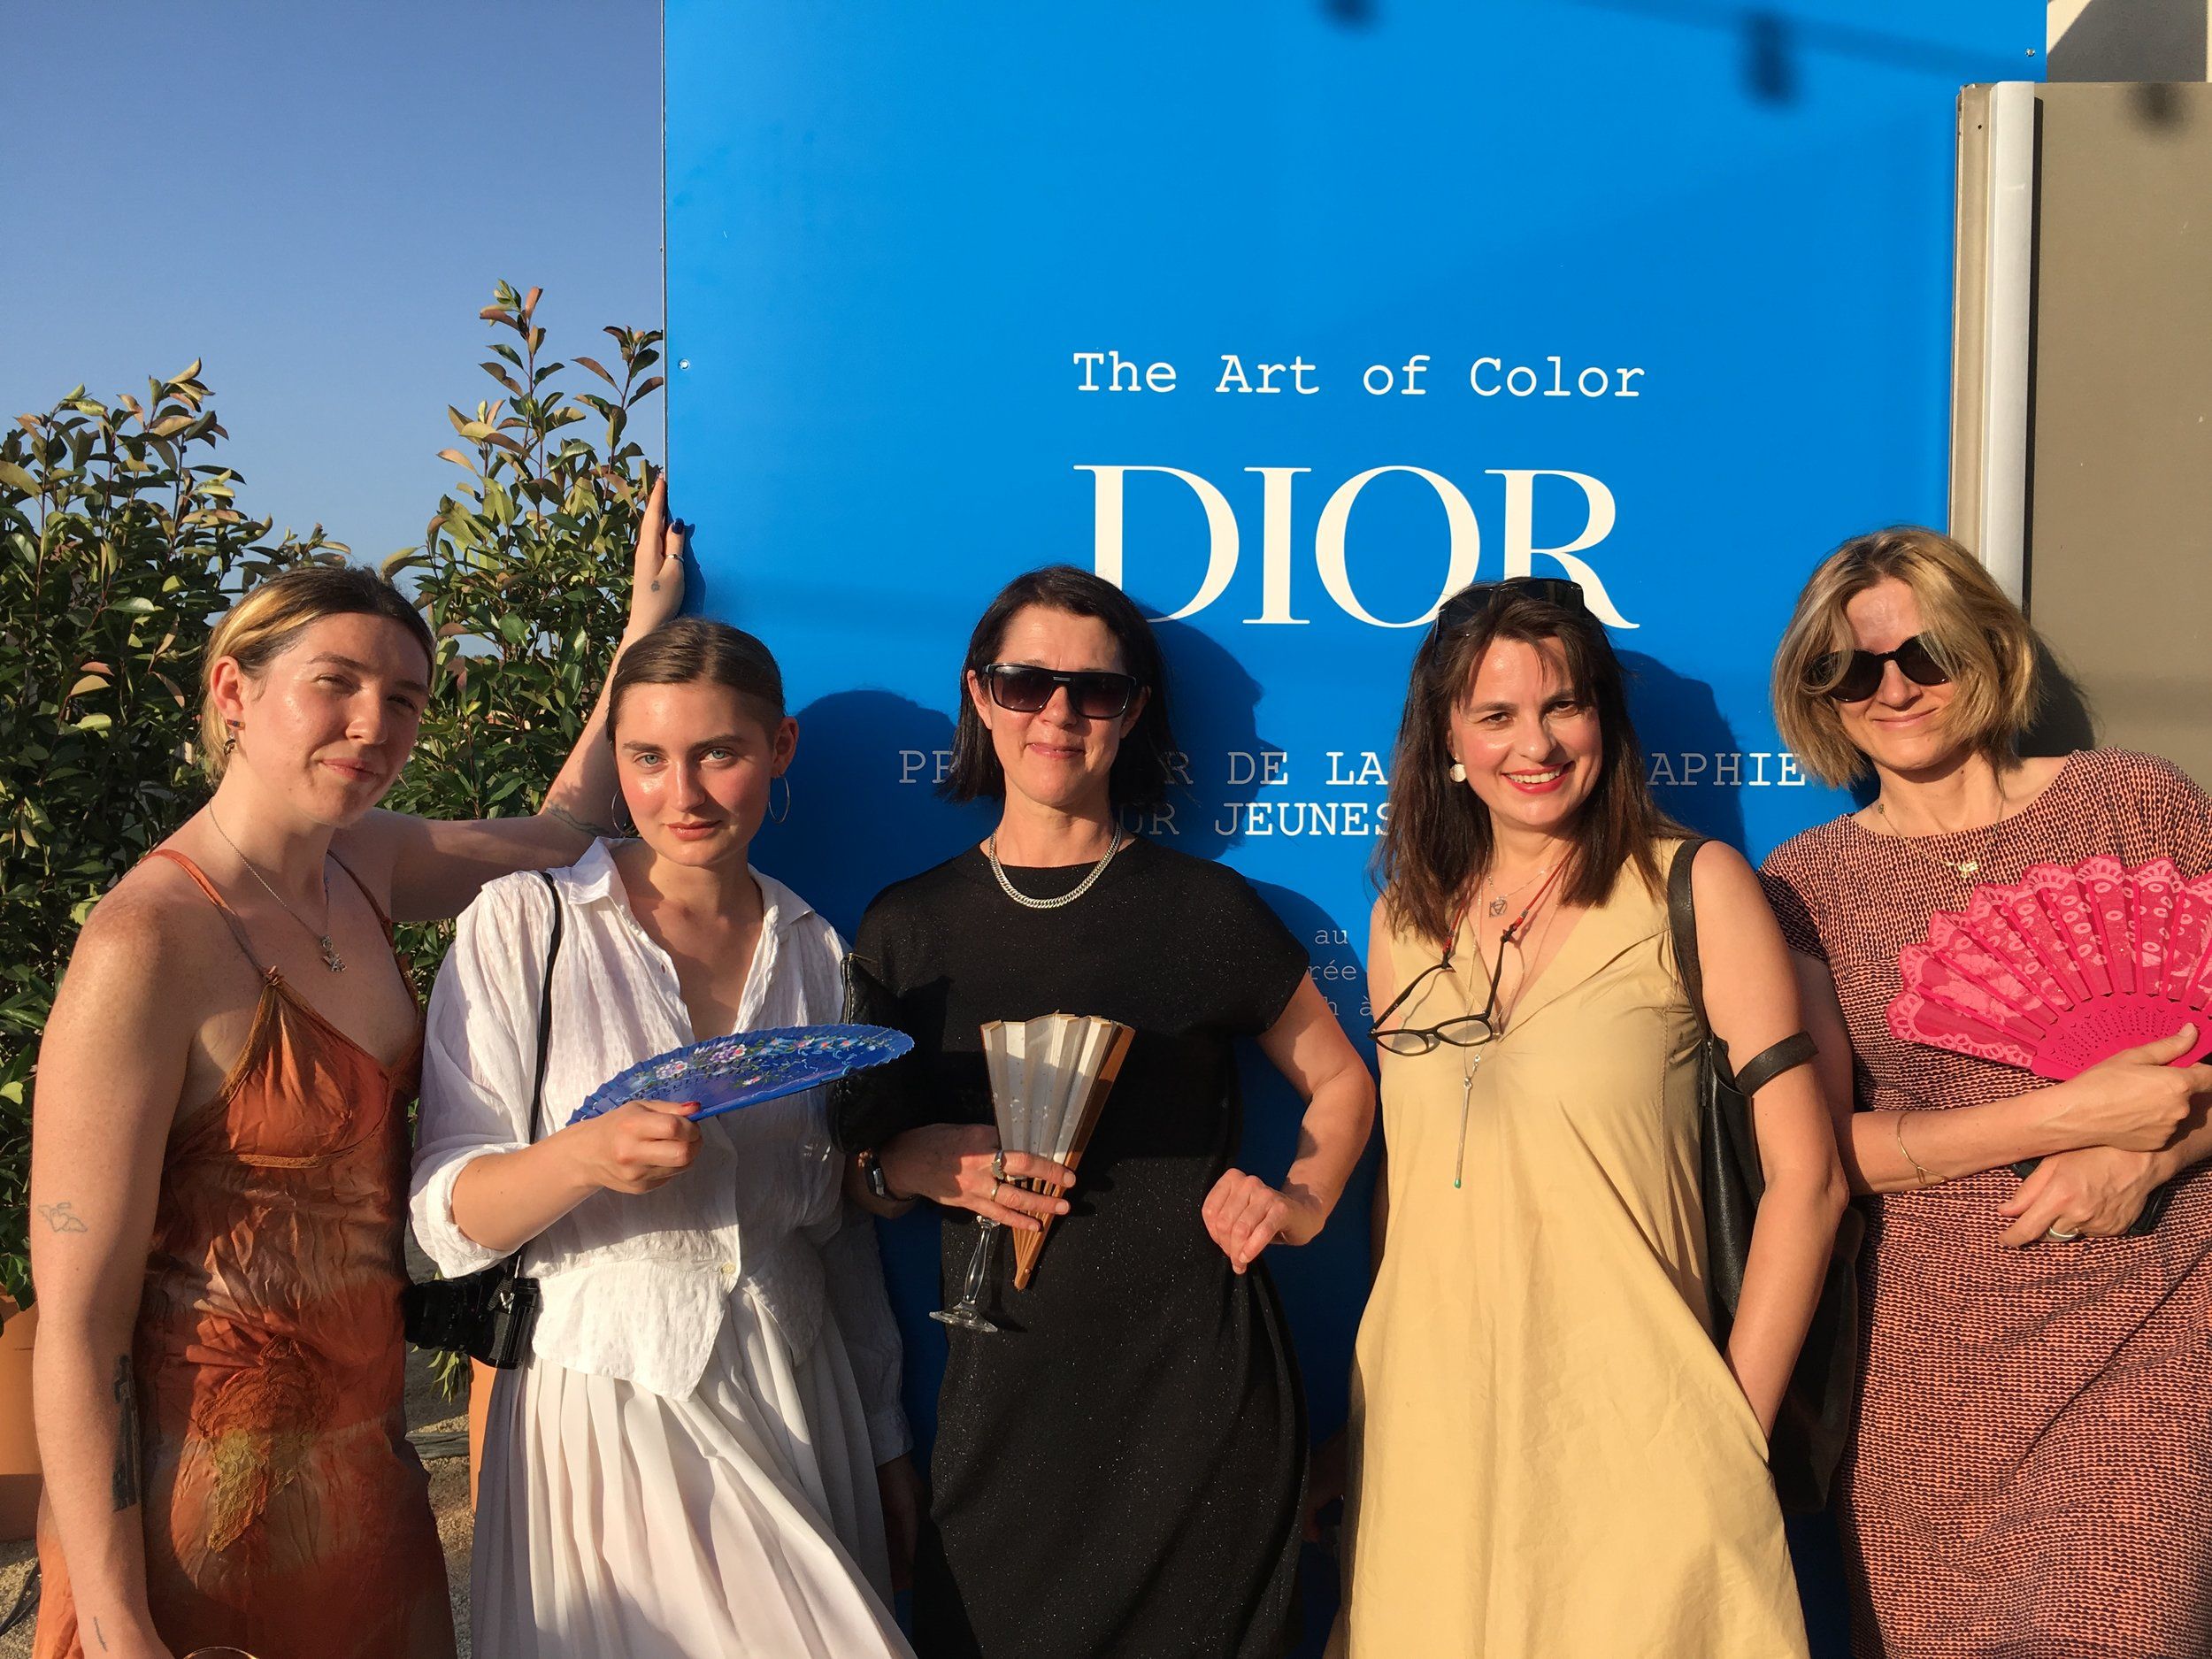 Brenna Horrox (director), Ozziline Bill (apprentice), Sarah Jones (friend & supporter), Rut Blees Luxemburg (director), Sophy Rickett (director),